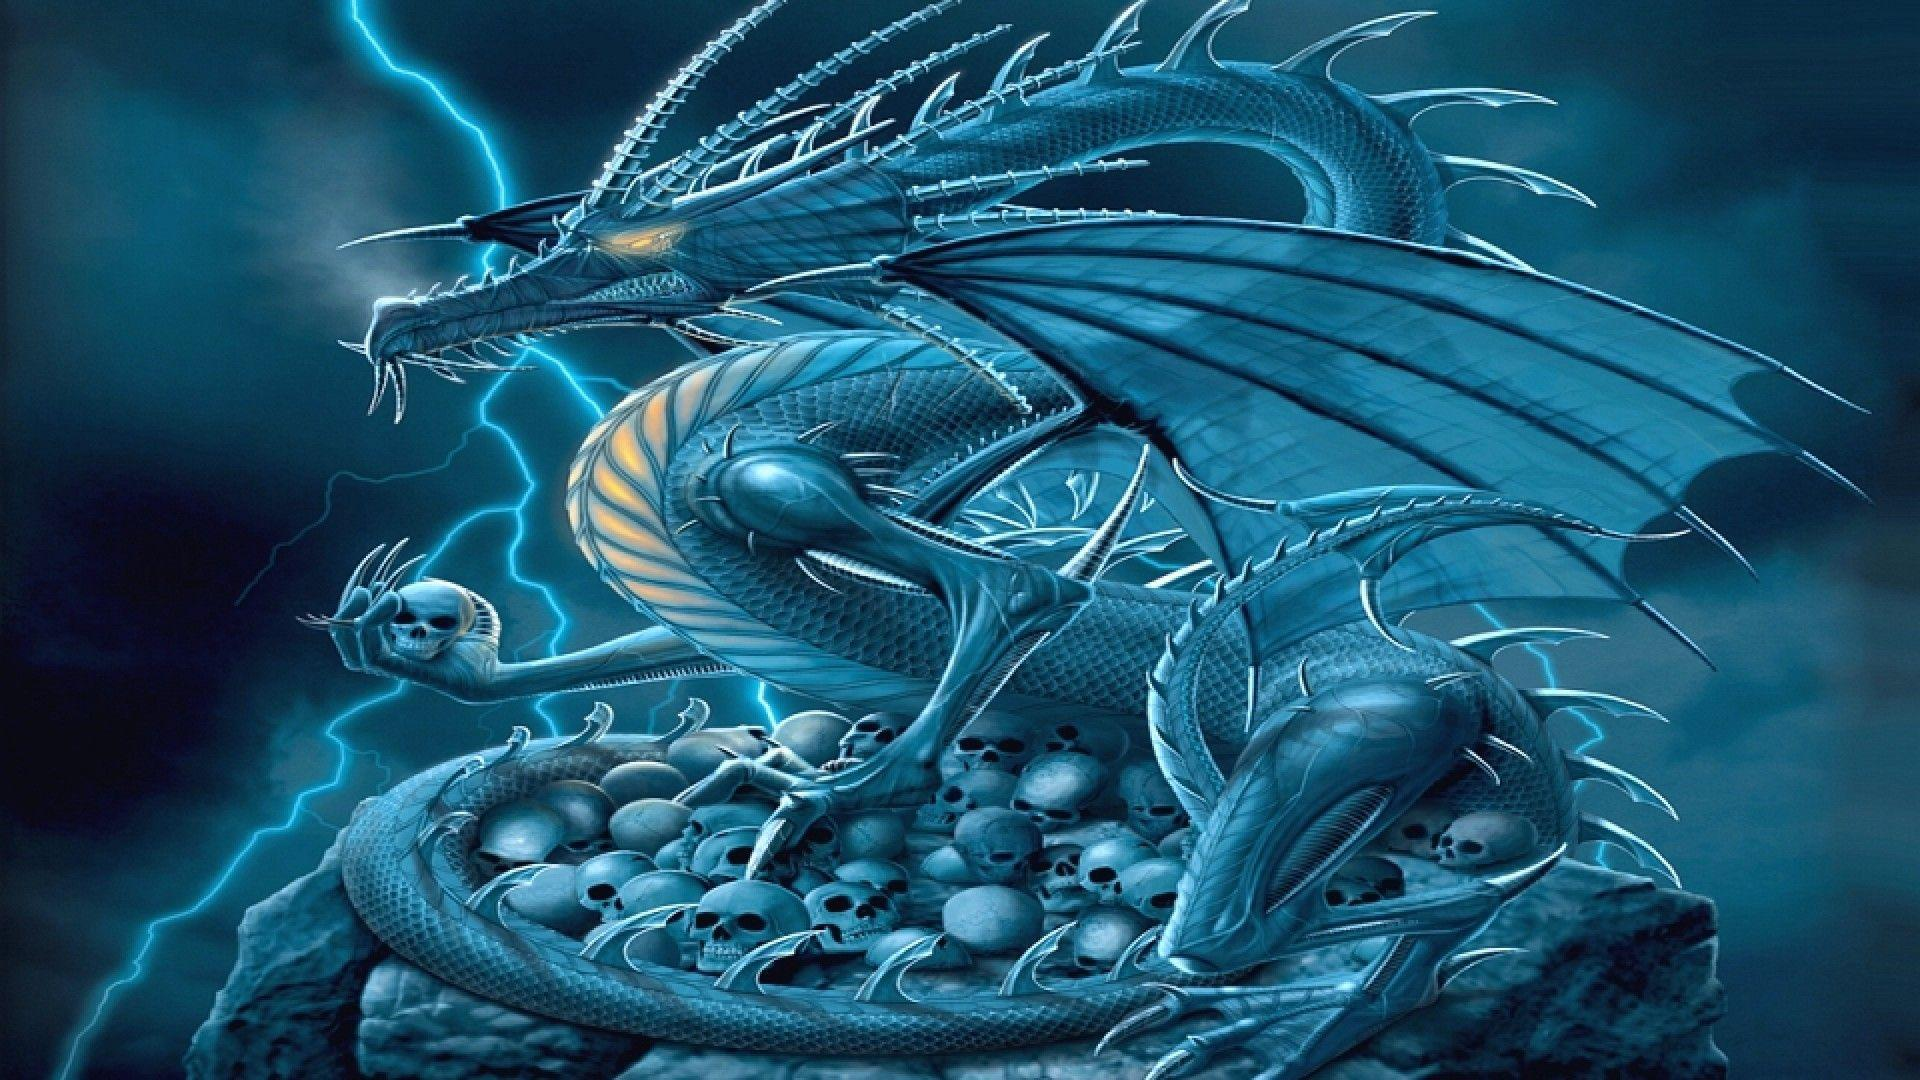 Free Dragon Wallpapers - Wallpaper Cave